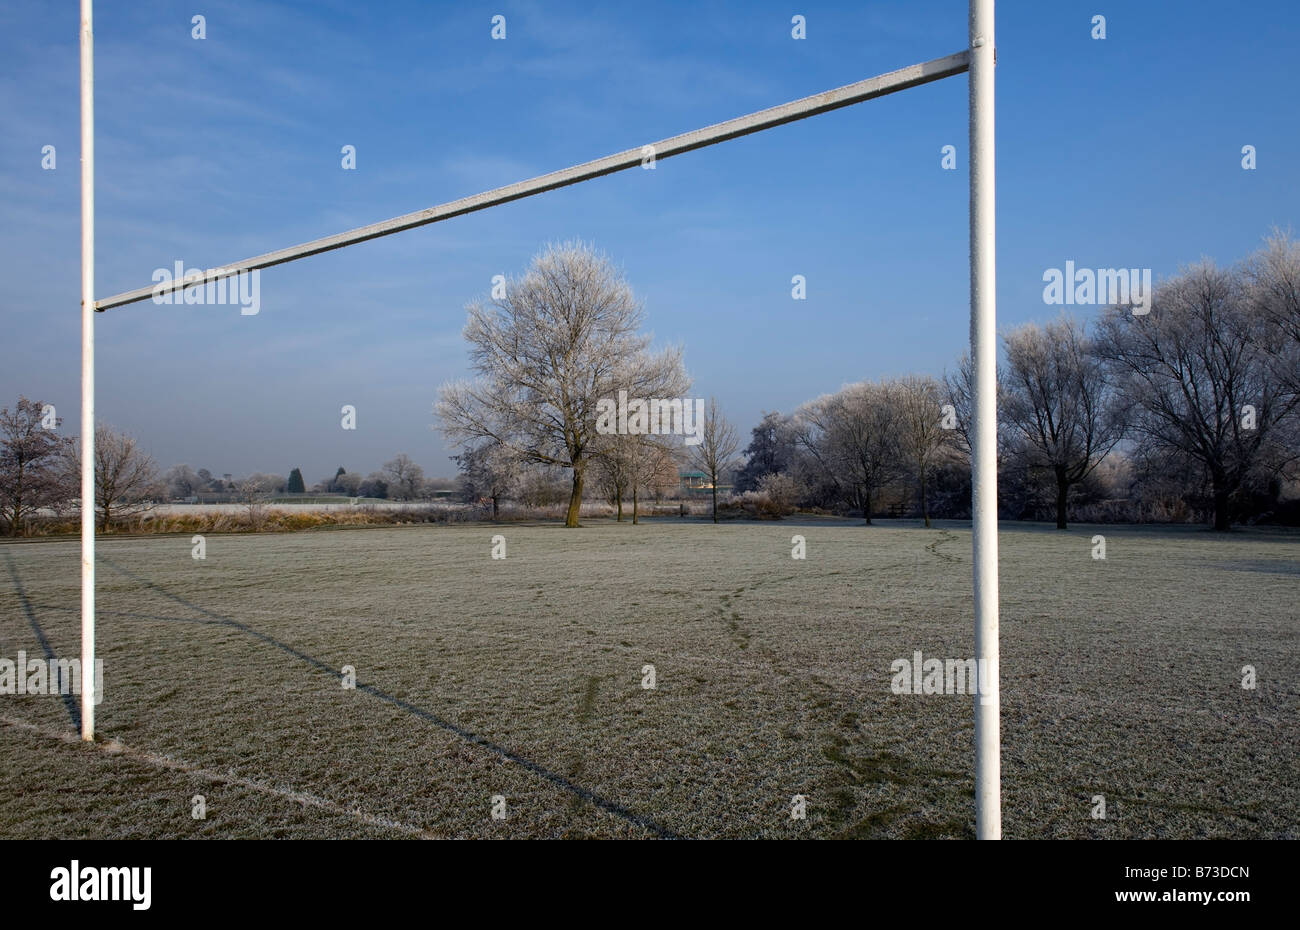 Temprano en la mañana helada cubierta de campo de rugby en Tonbridge, Kent, UK Foto de stock